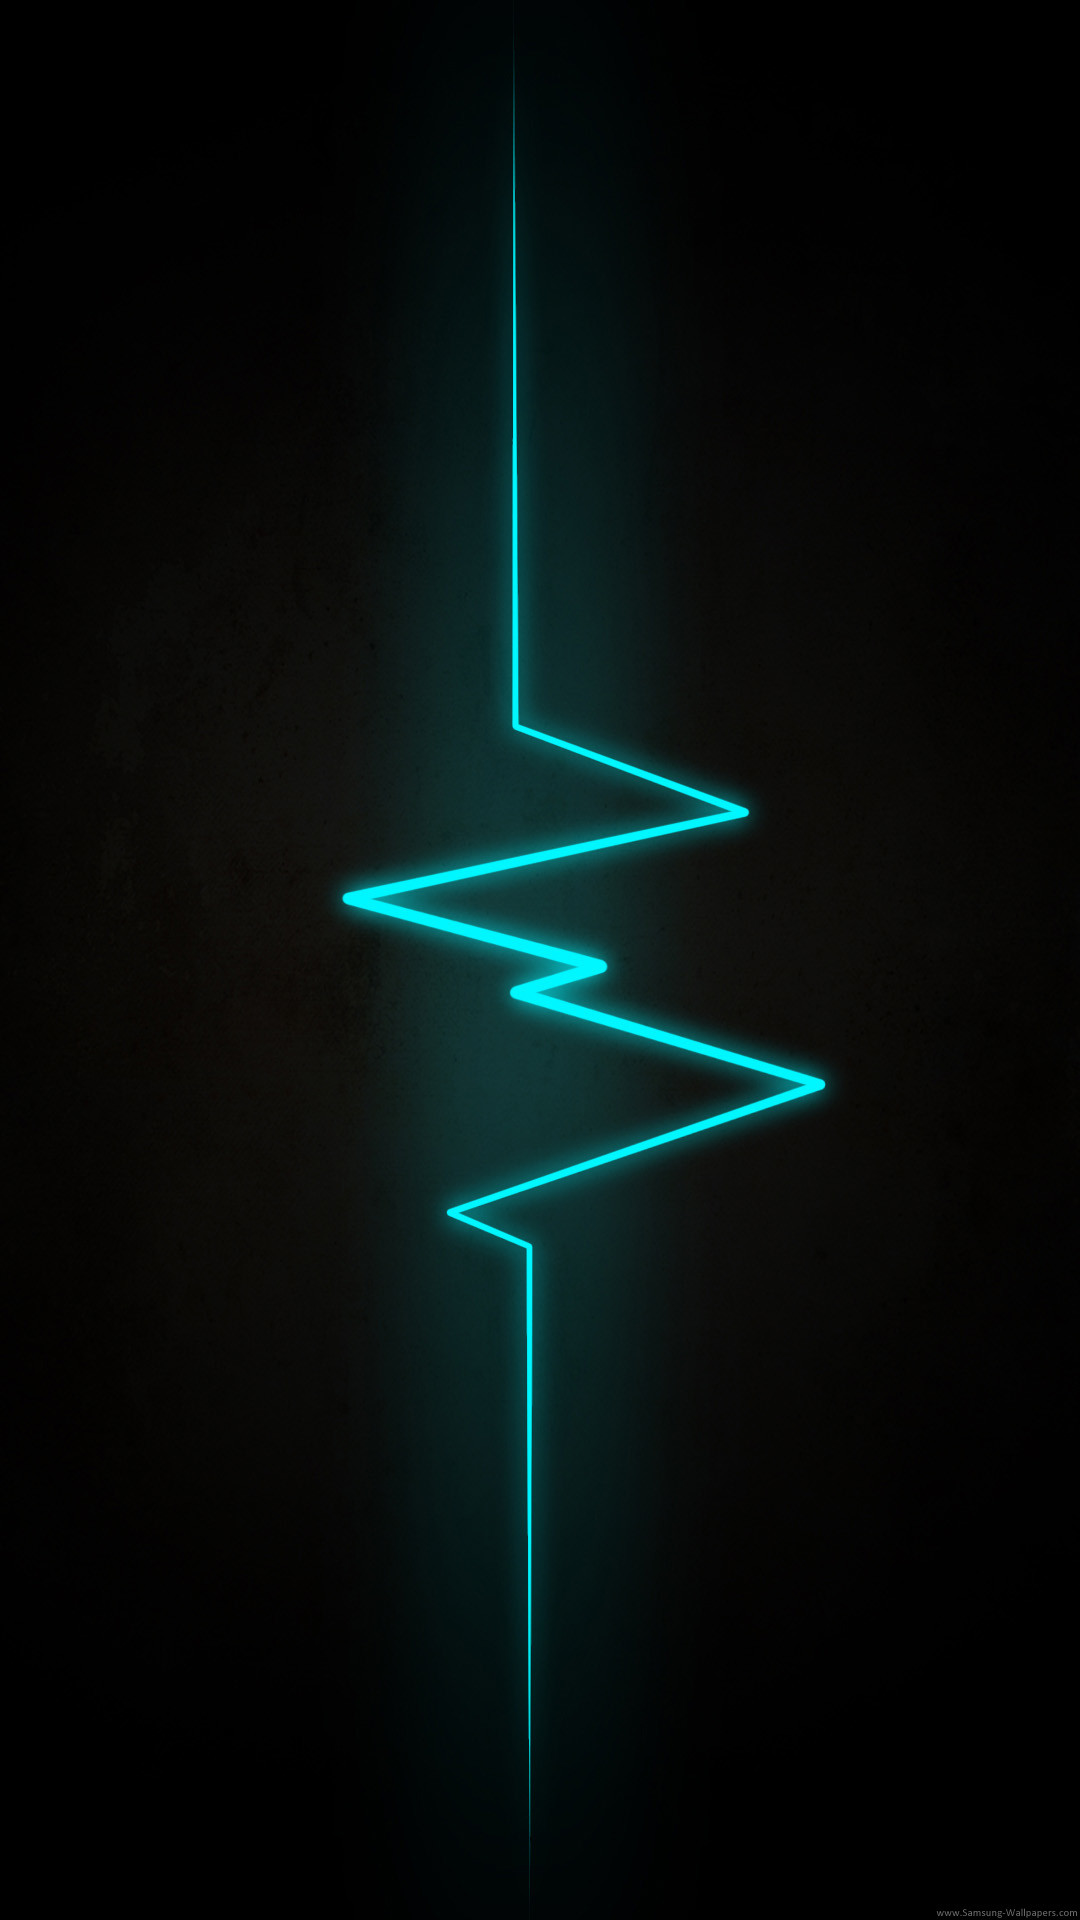 Lifeline Signal Vertical Lockscreen Android Wallpaper free download